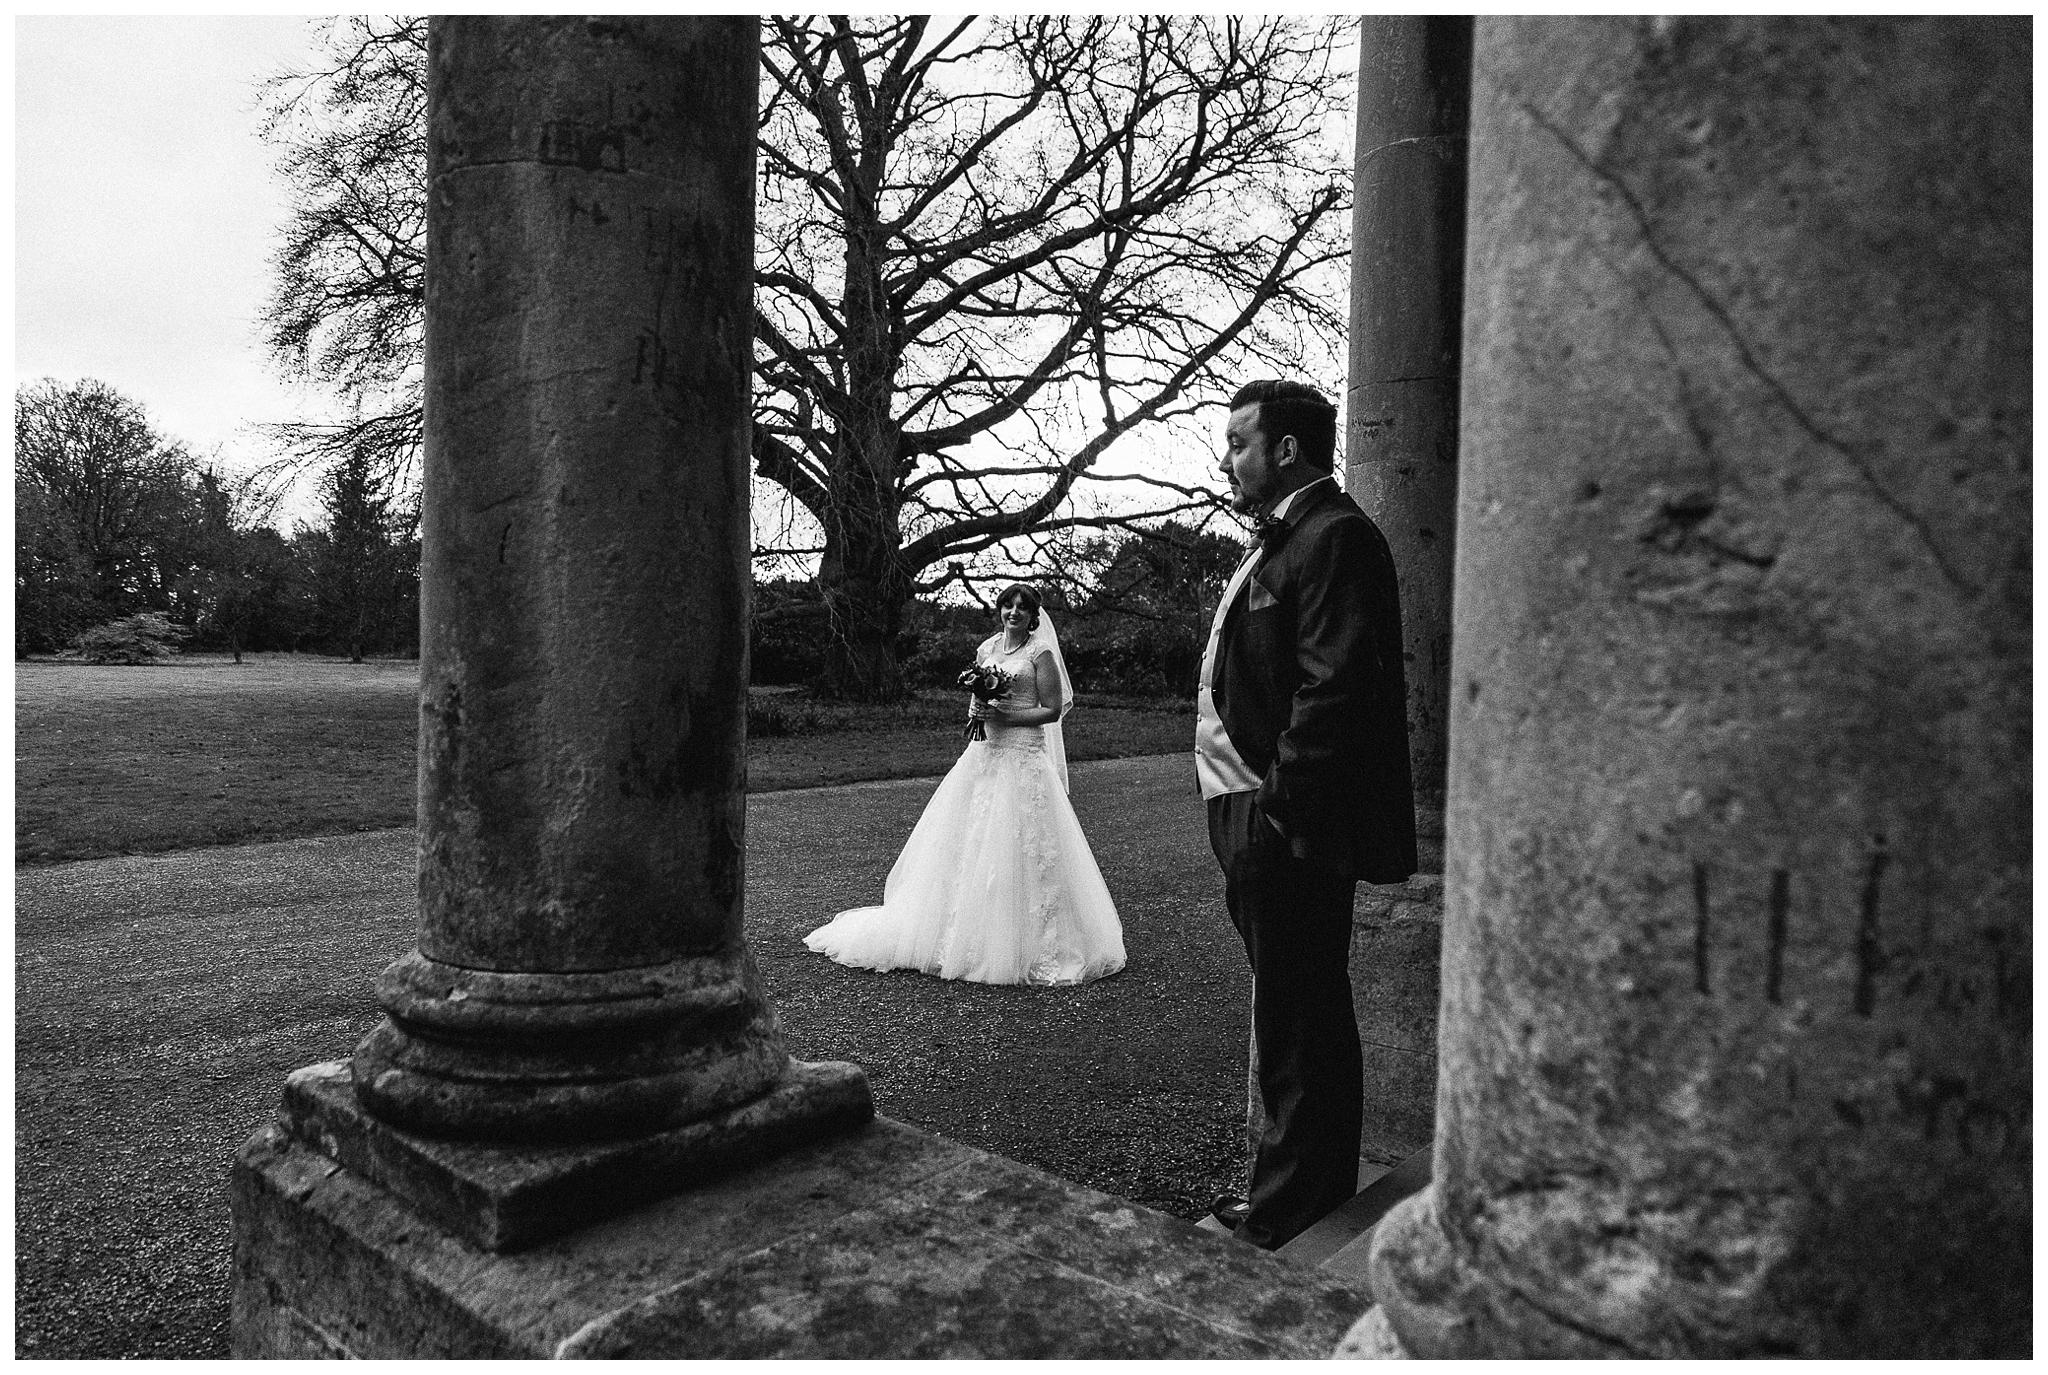 Emma&Paul-Elmore-Court-Winter-Wedding-Nikki-Cooper-Photography_0075.jpg